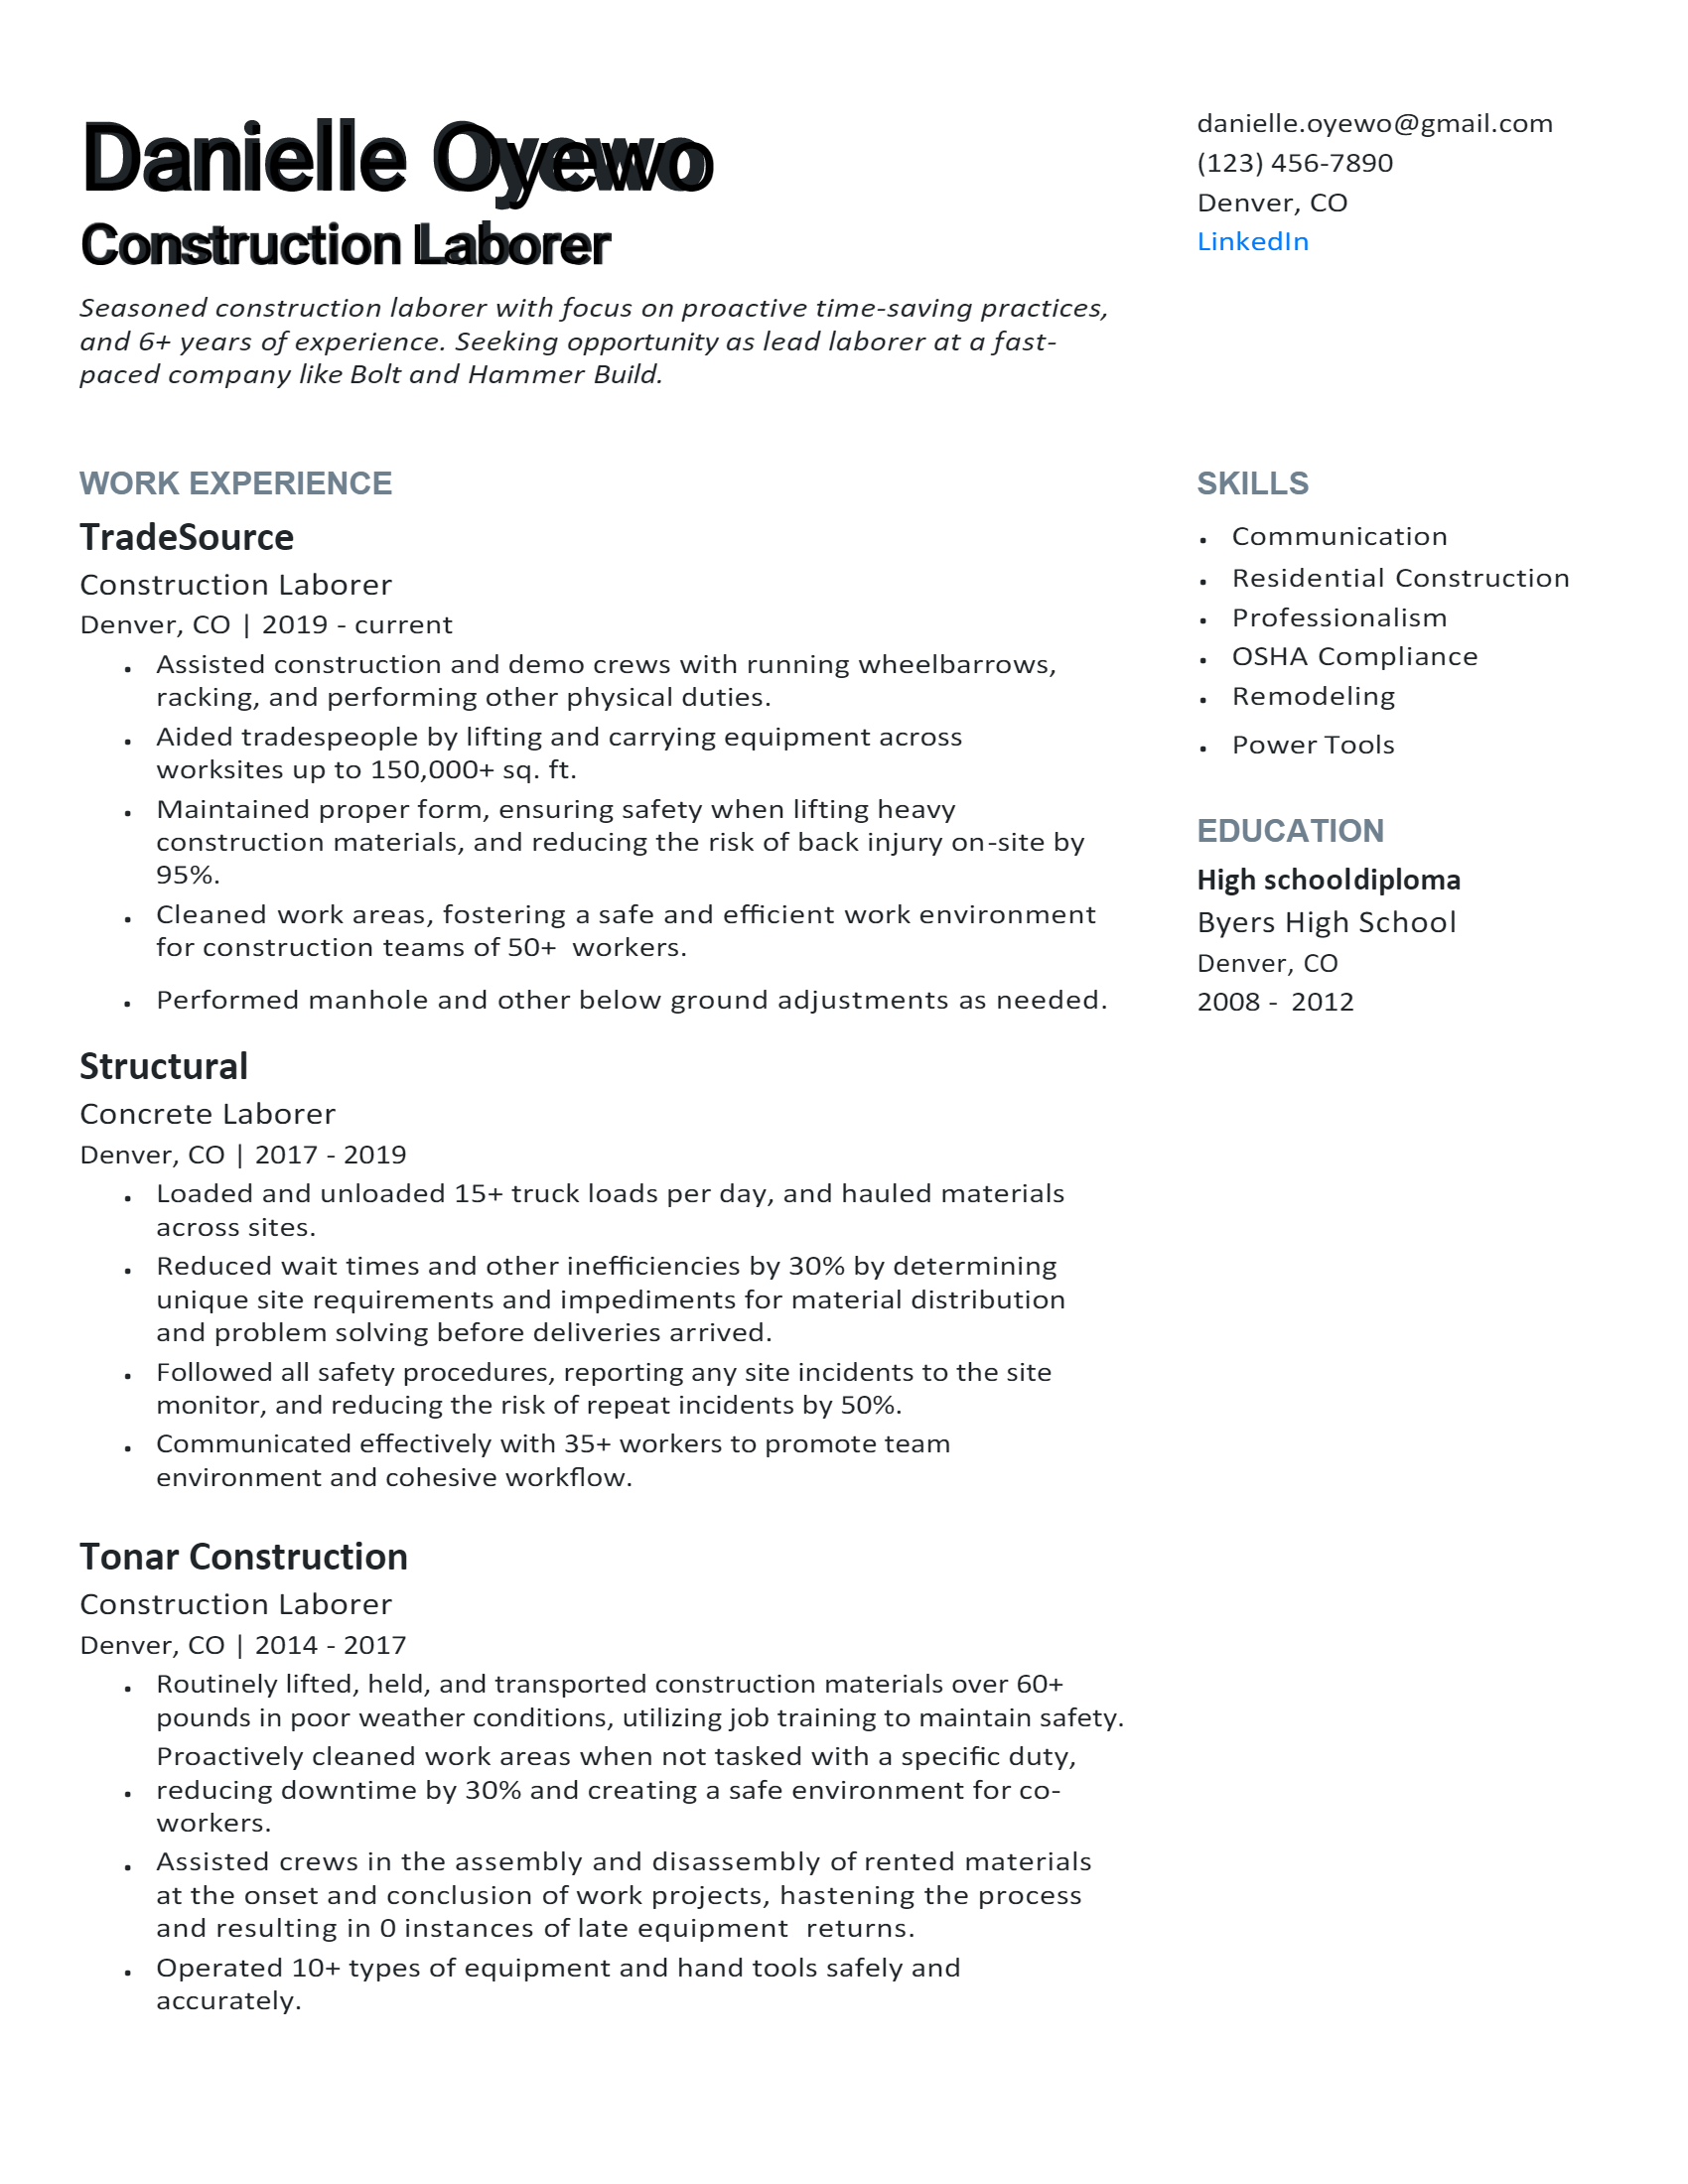 Construction Laborer Resume